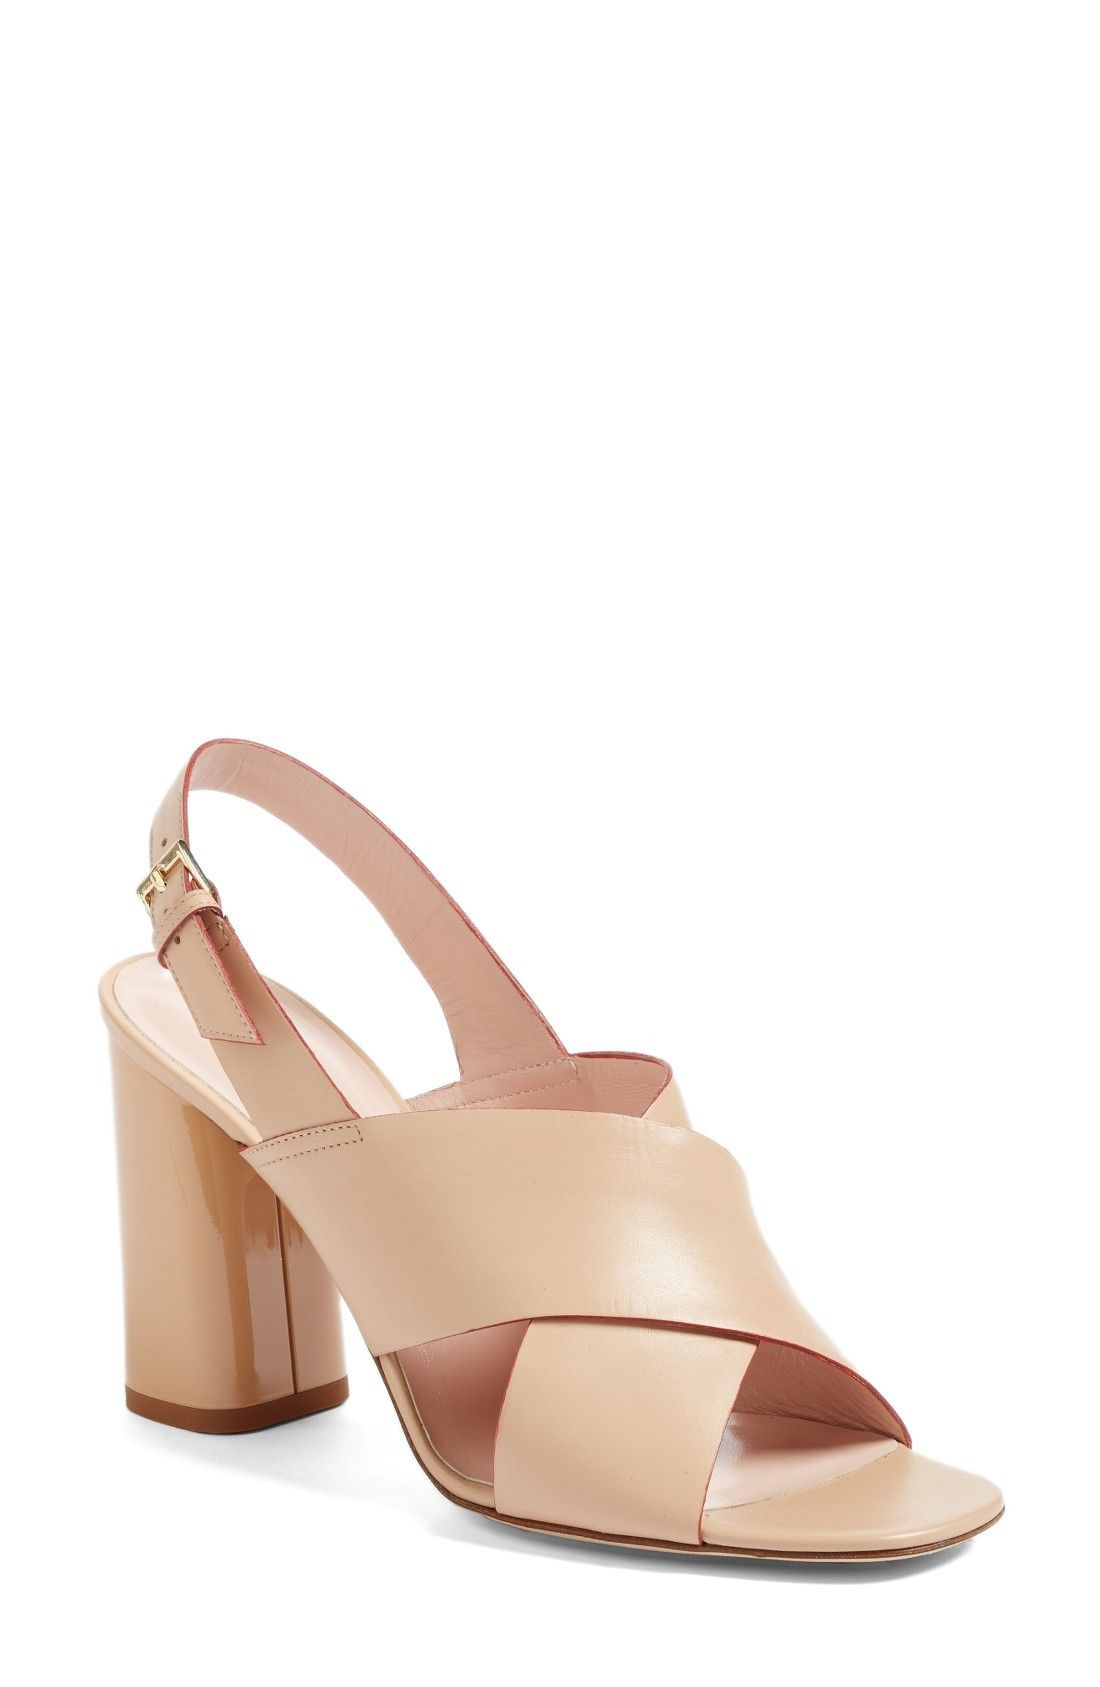 18dc85947783 Main Image - kate spade new york christopher sandal (Women)